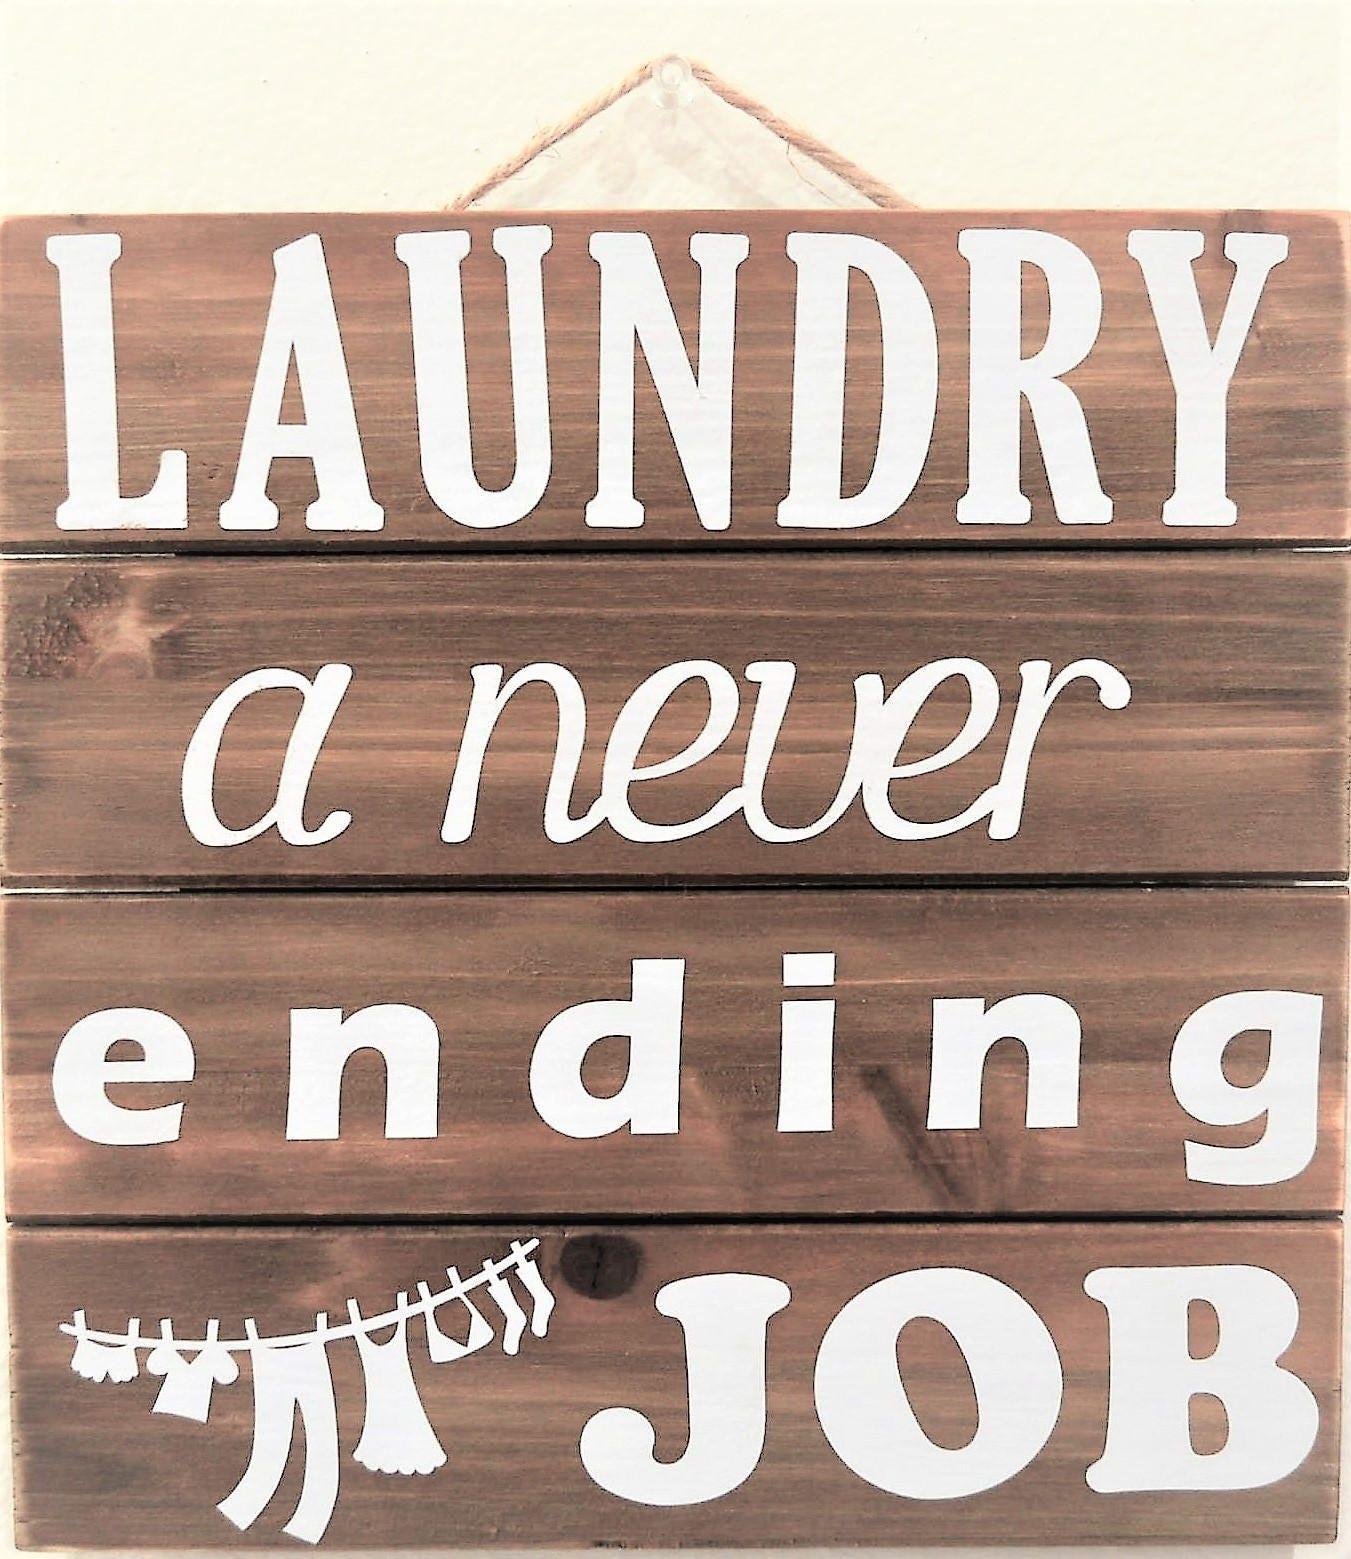 Laundry Room Signs Decor: Laundry Sign Laundry Decor Laundry Room Decor